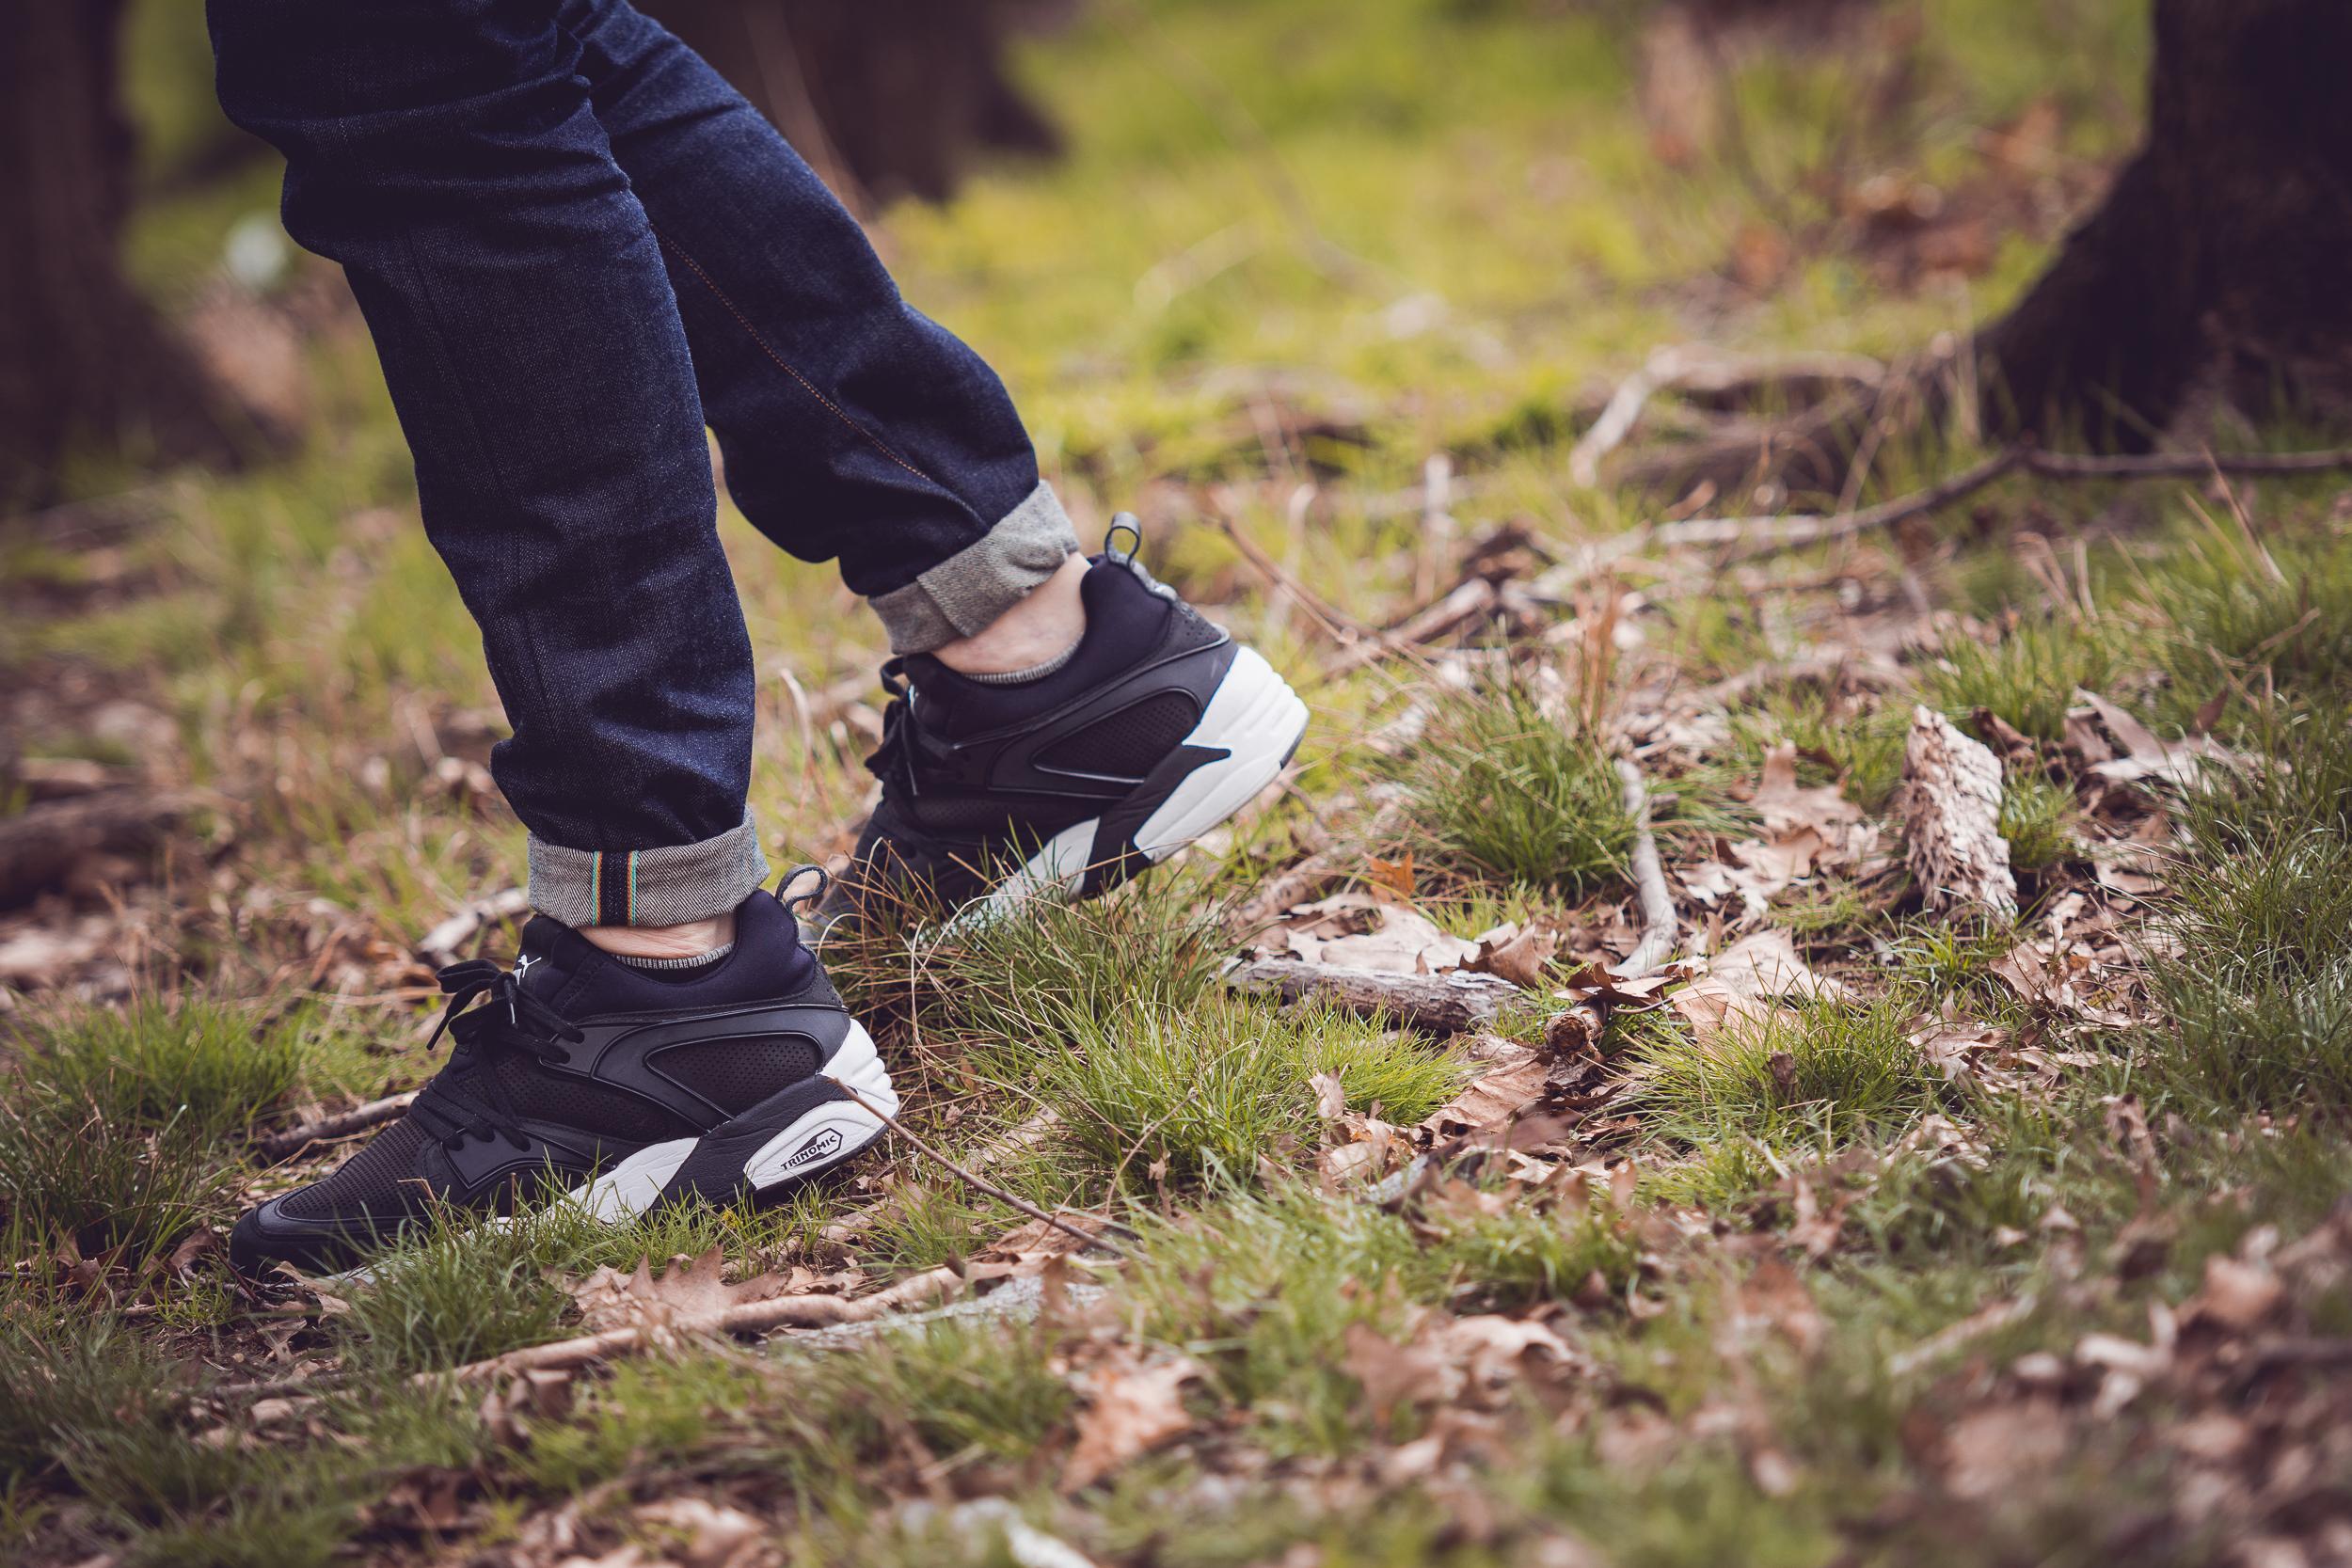 Sfondi : foresta, natura, erba, Nikon, scarpe da ginnastica